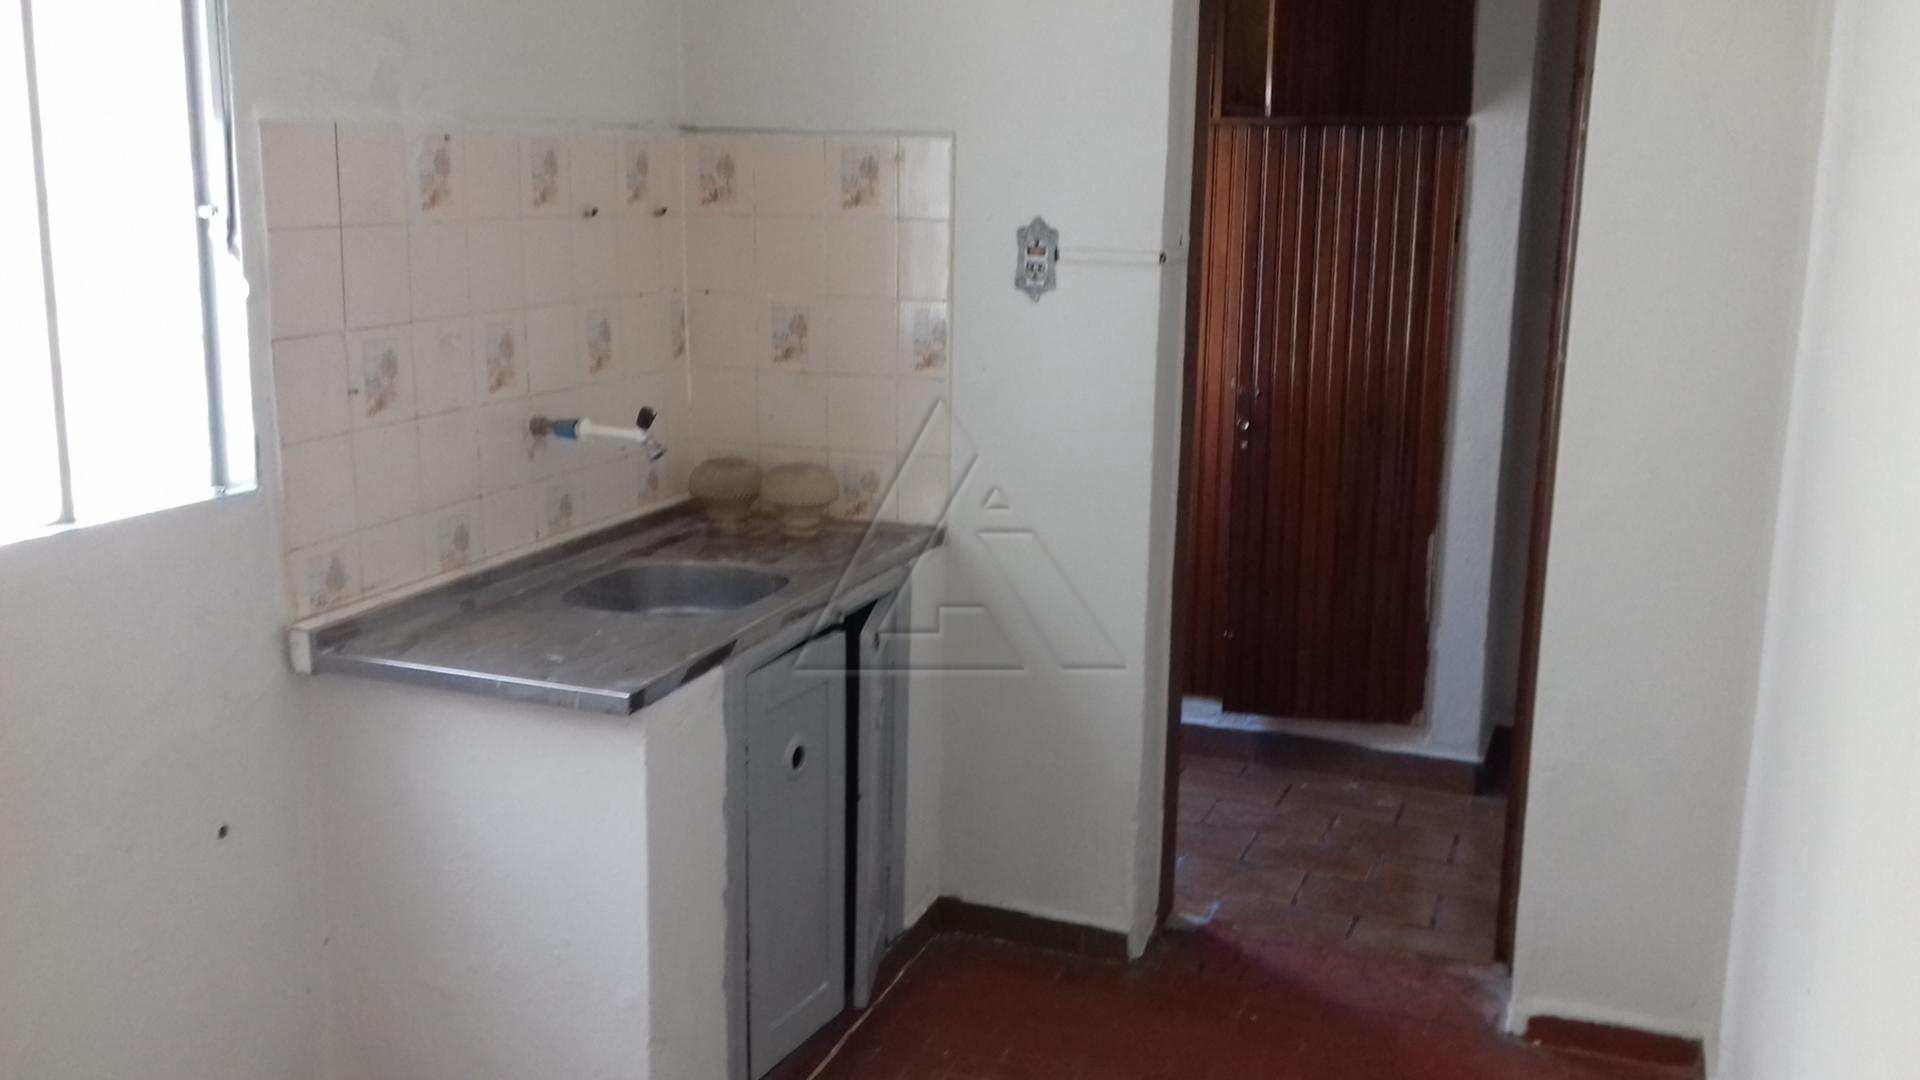 Casa com 2 dorms, Jardim Monte Kemel, São Paulo, Cod: 2953